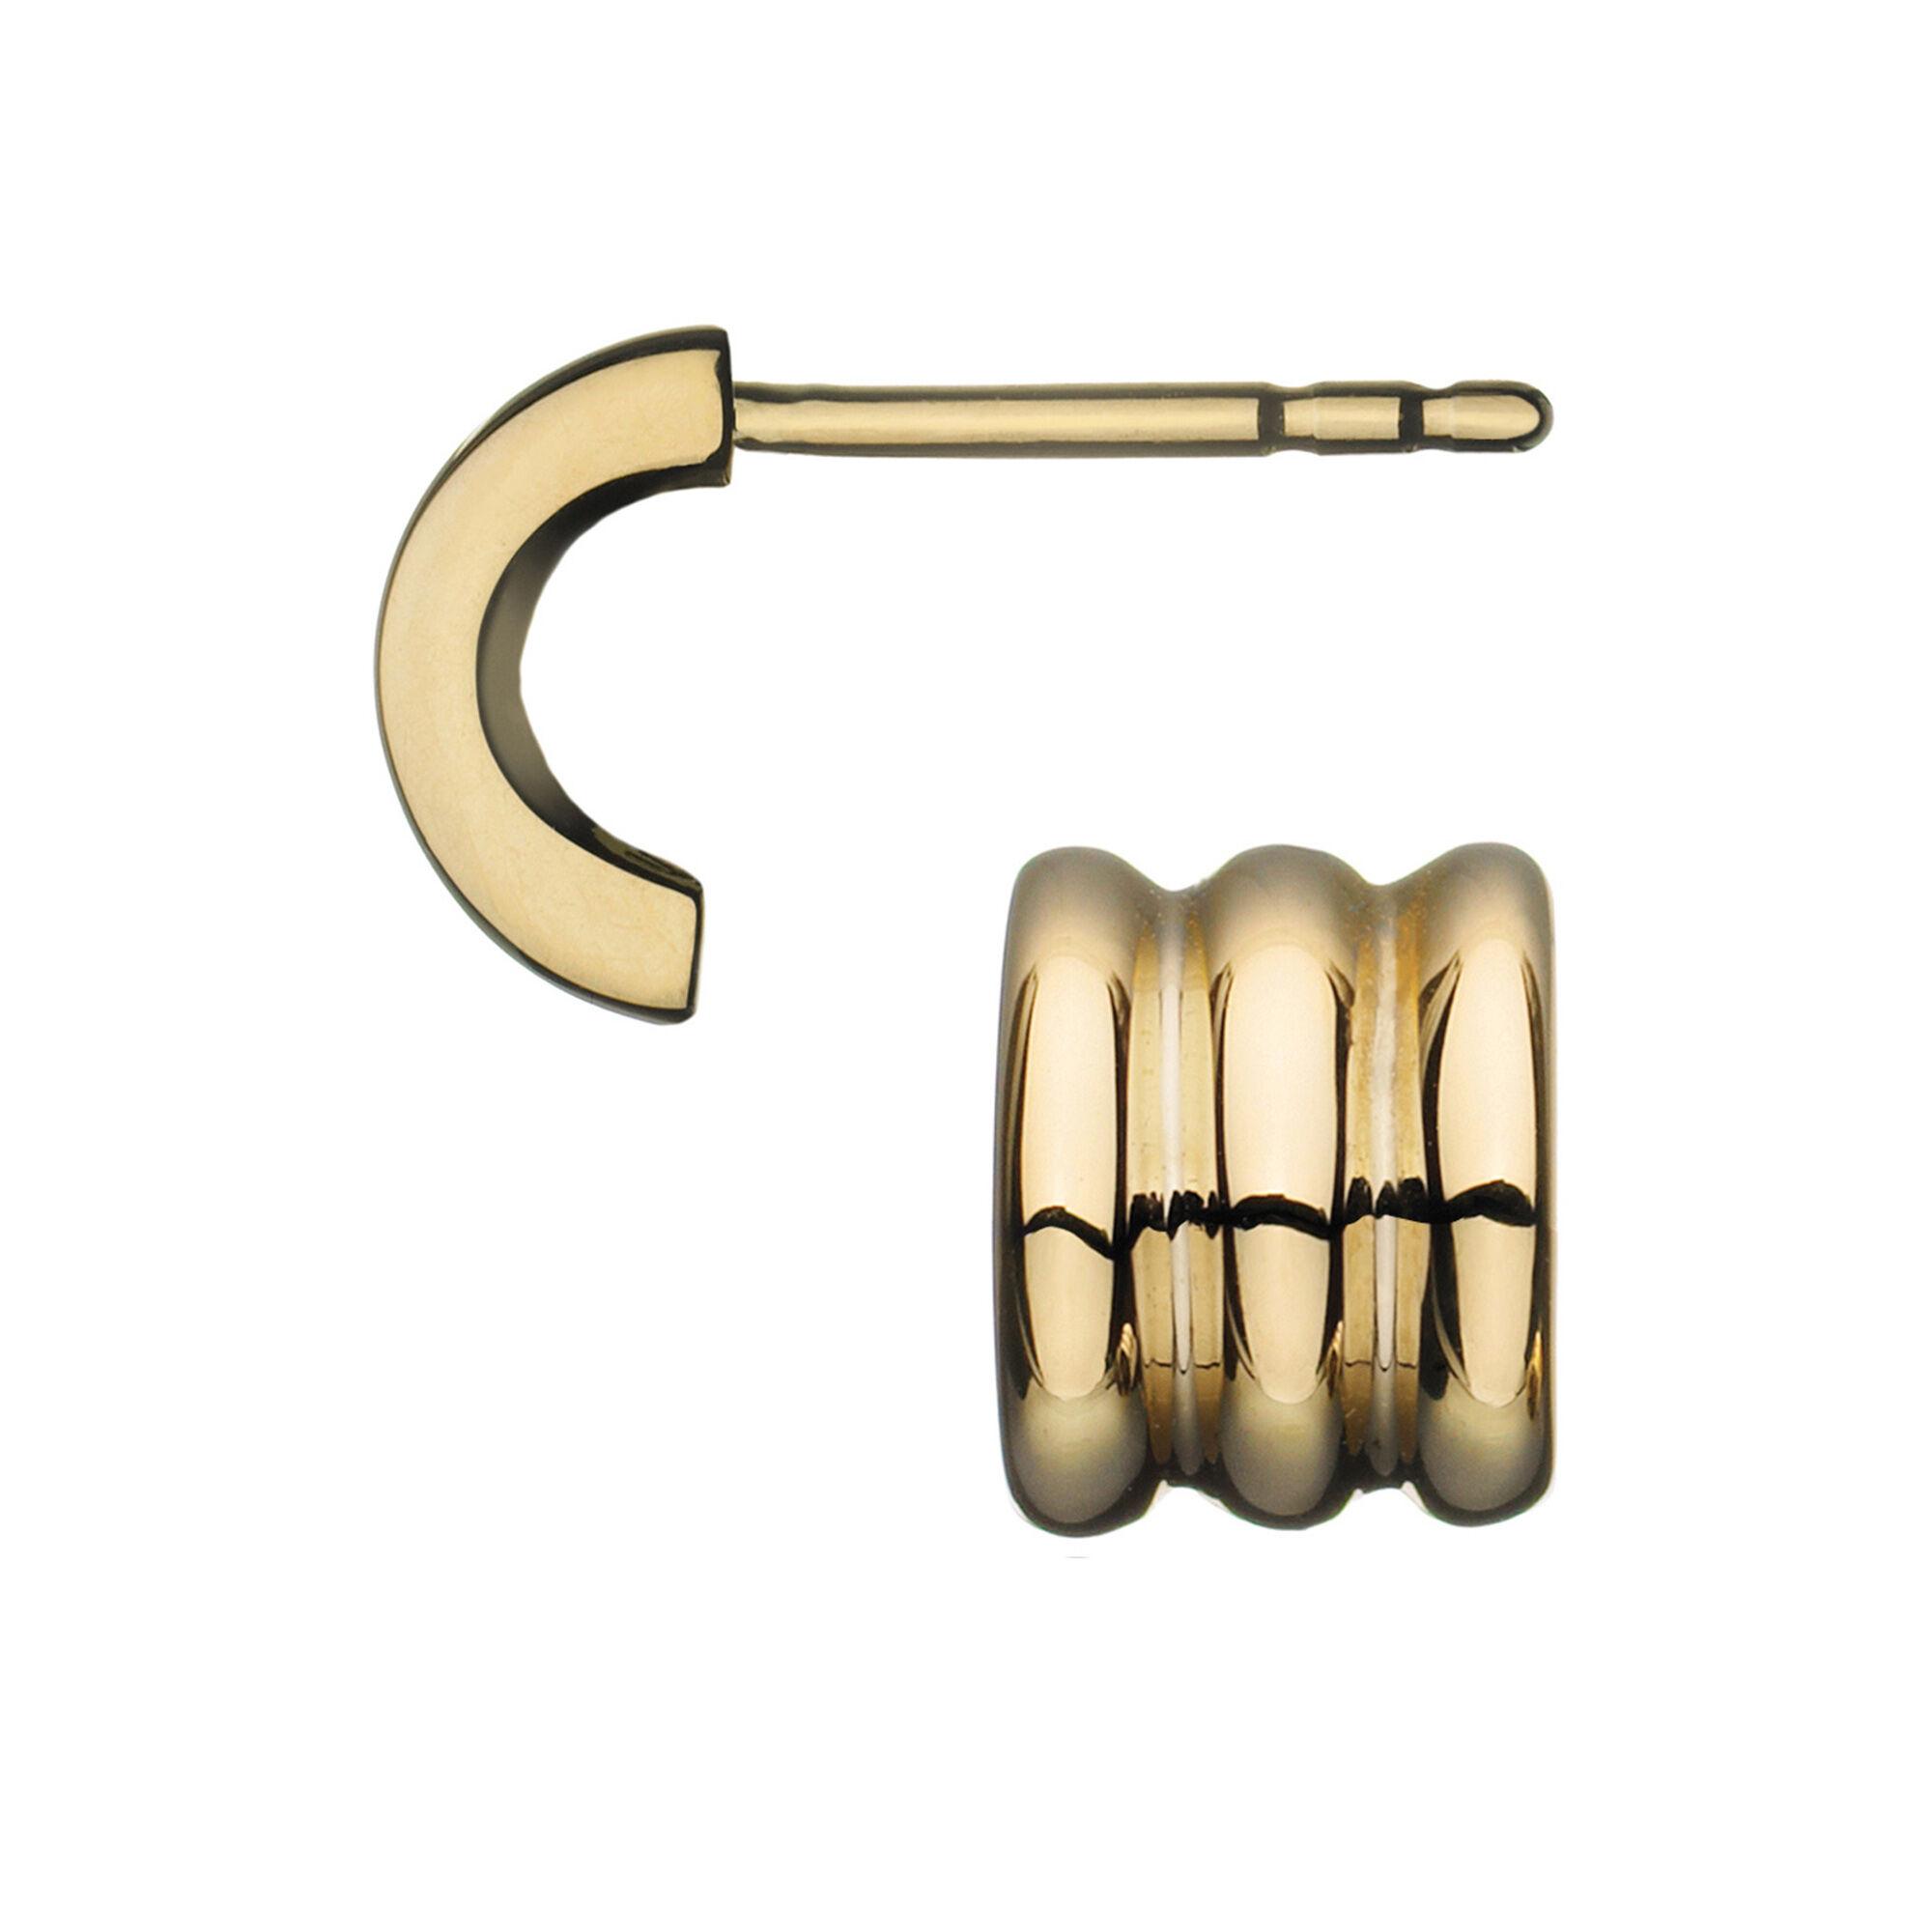 Sweetie 18kt Yellow Gold Stud Earrings Hires